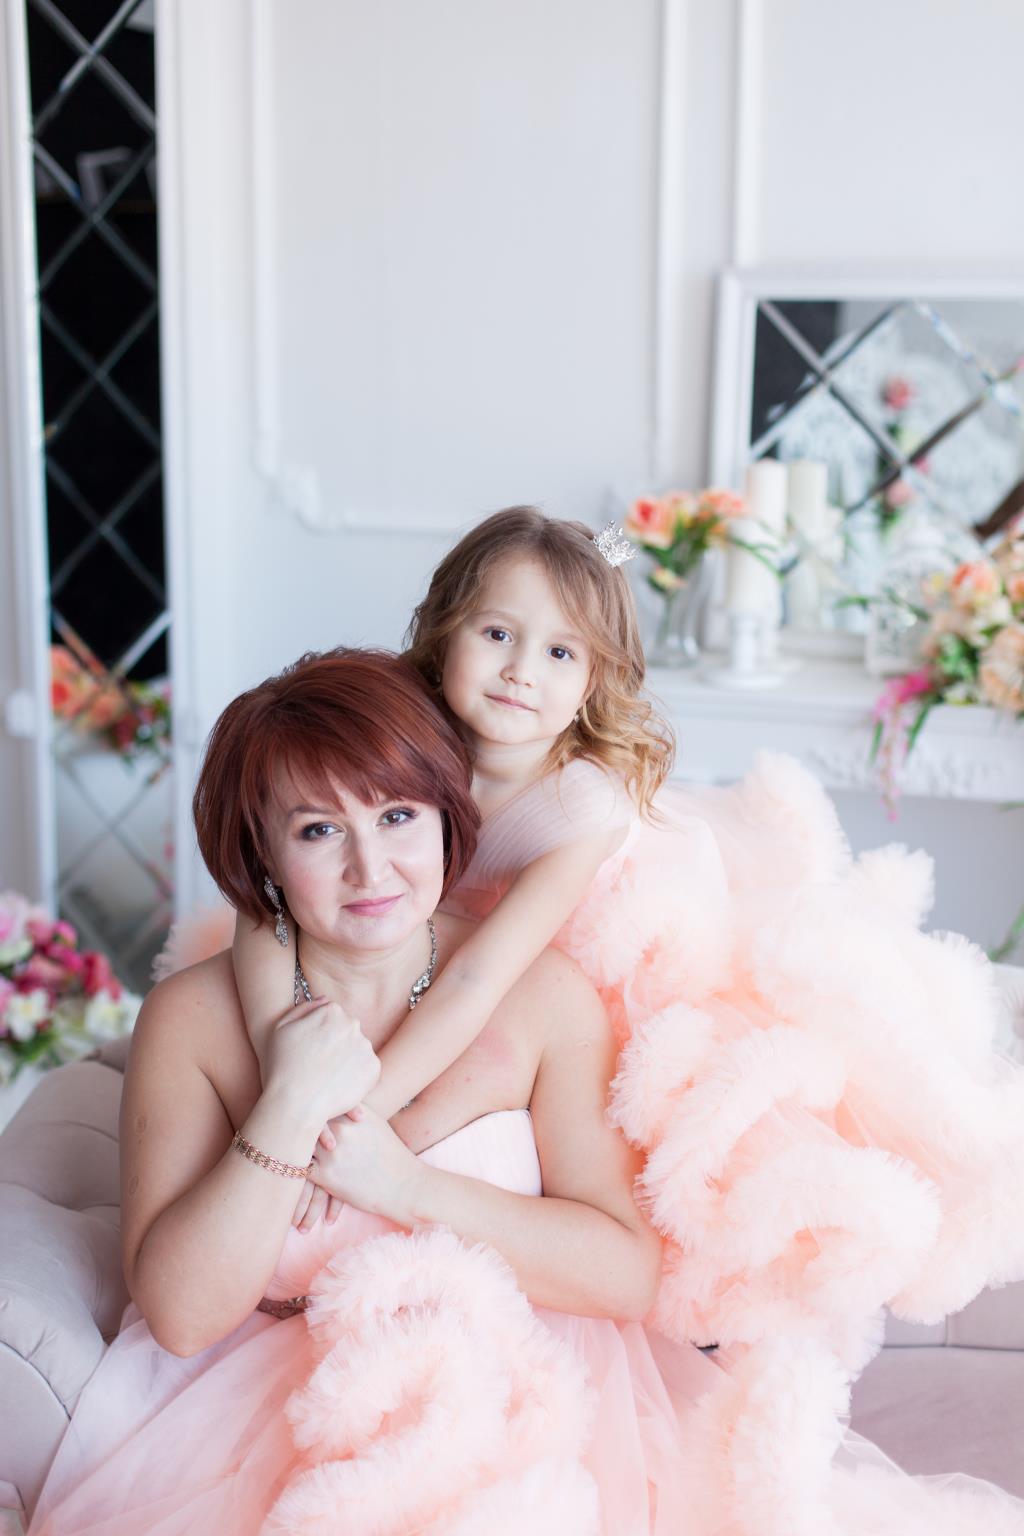 Мама и доча. Яркий образ